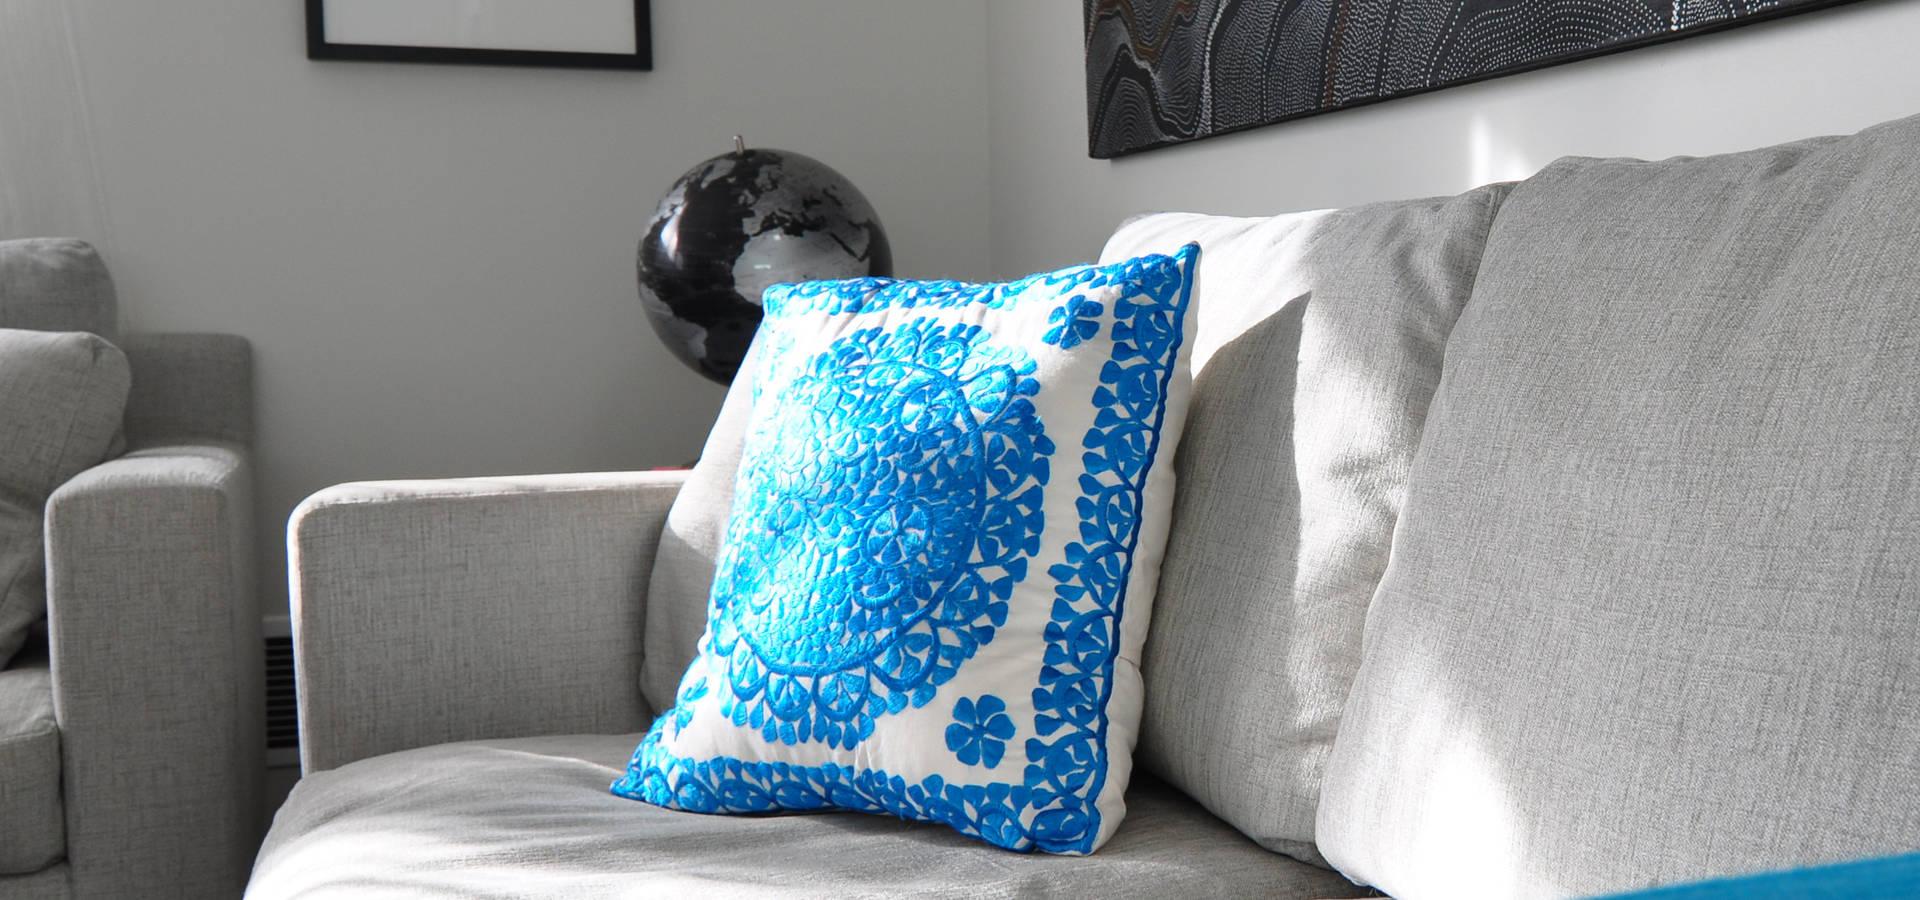 Natasha Fowler Design Solutions